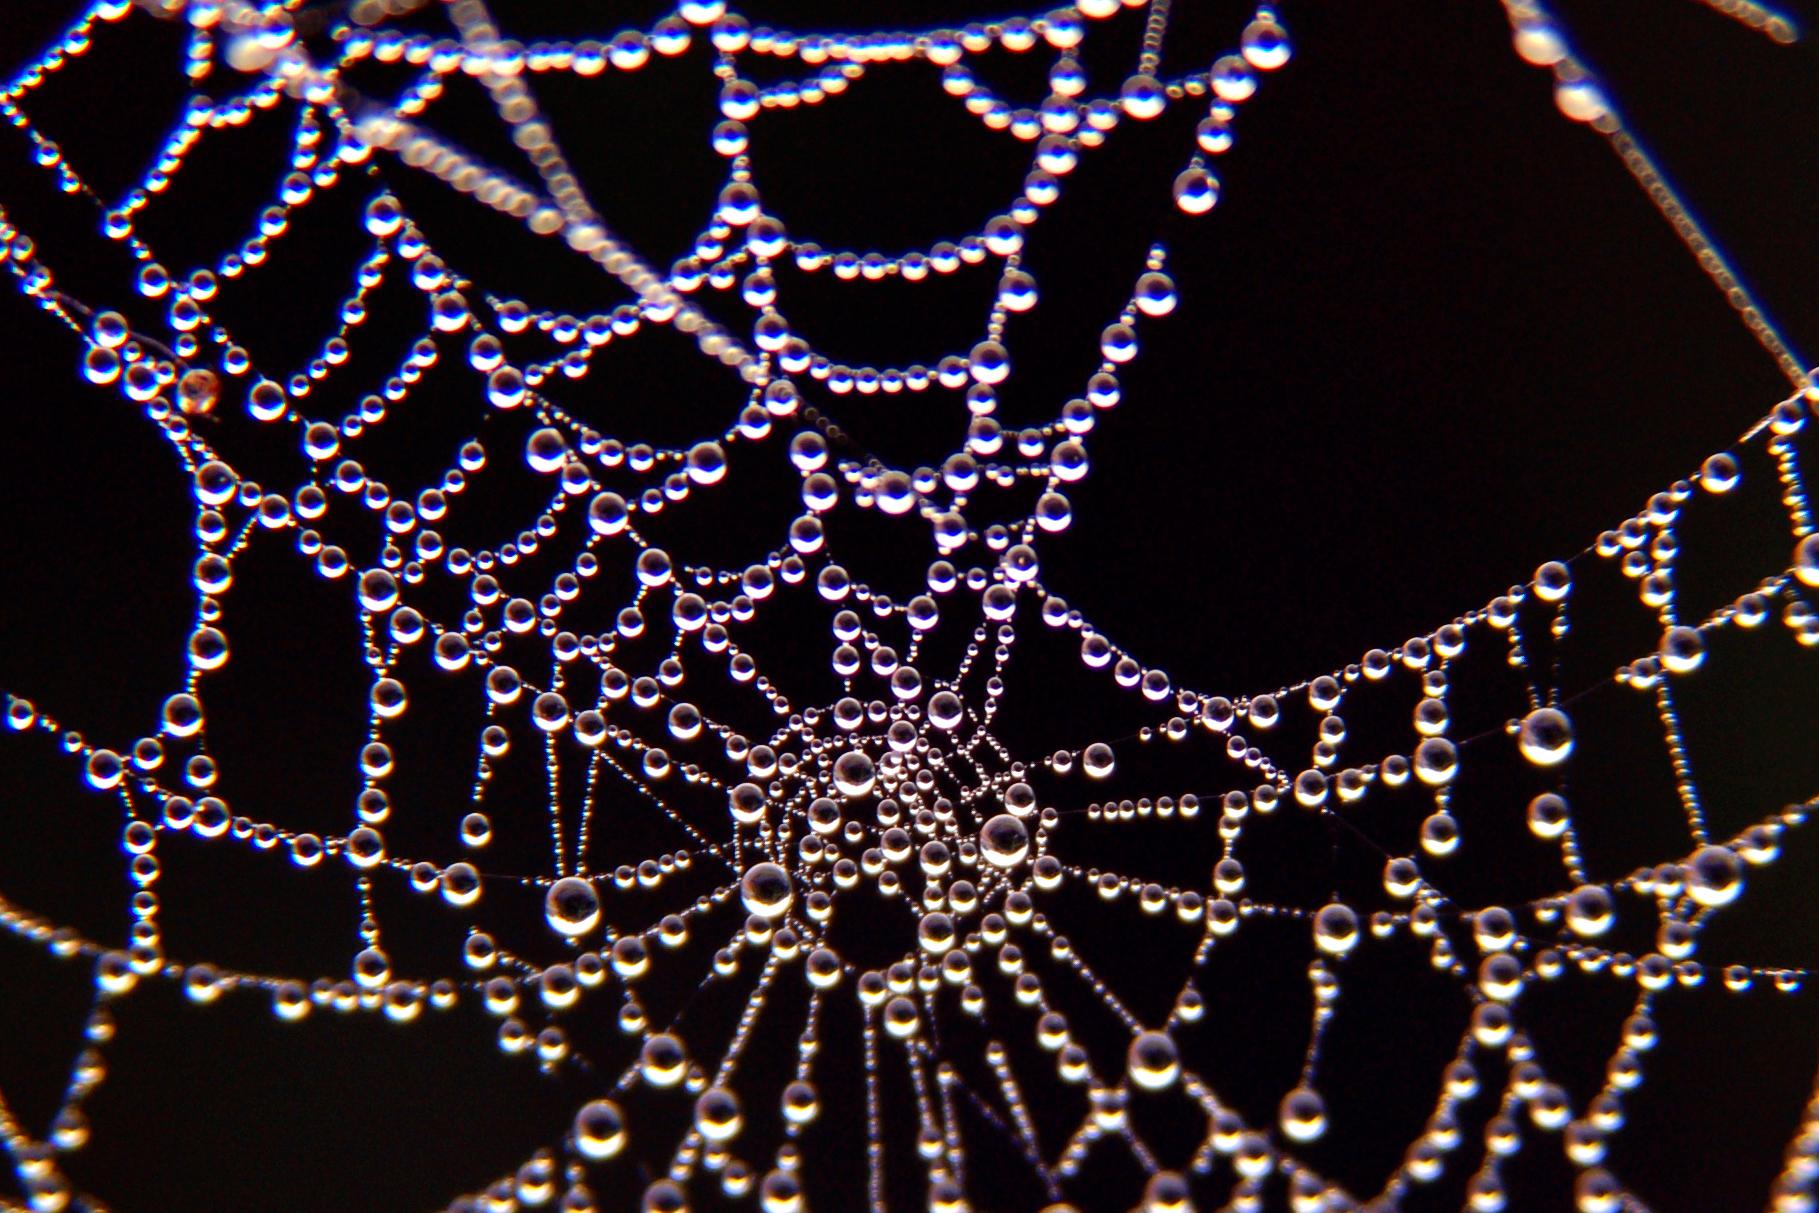 Spider Web Water Christmas Lights Pattern Moisture Branch Twig Symmetry